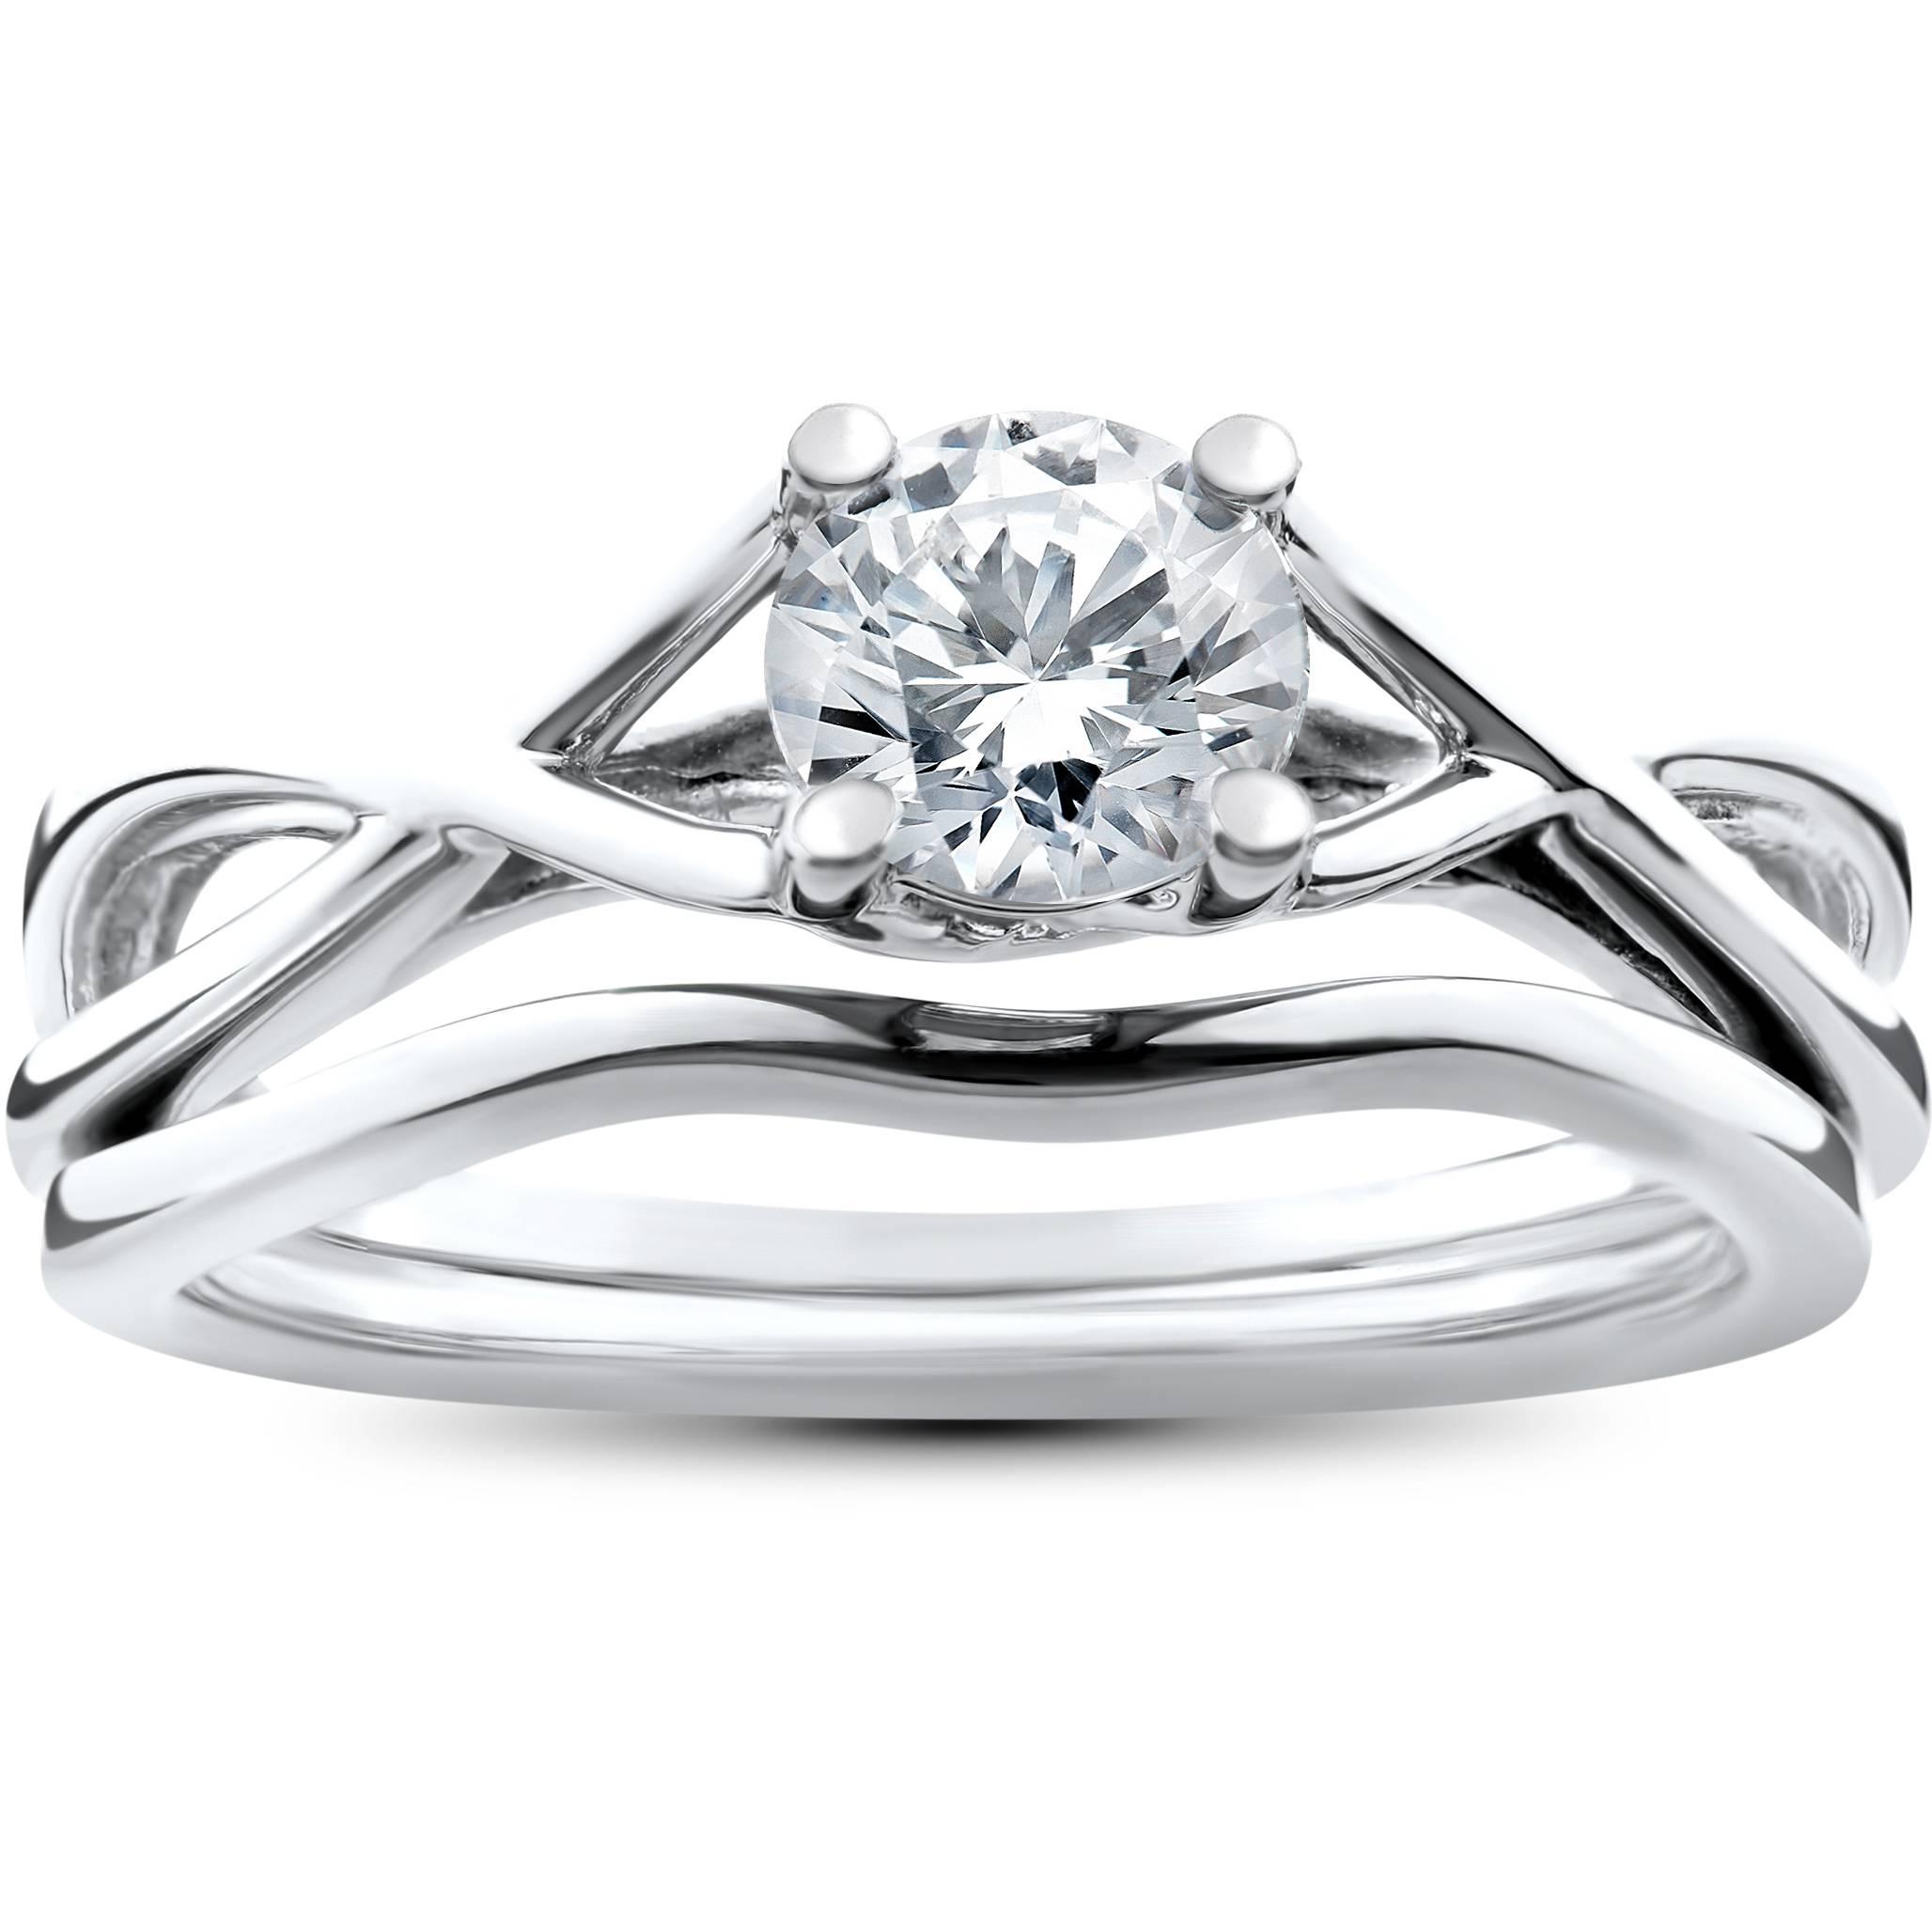 Matching Diamond Engagement And Wedding Ring 1 46ct: 1/2 Ct Solitaire Diamond Engagement Ring Infinity Matching